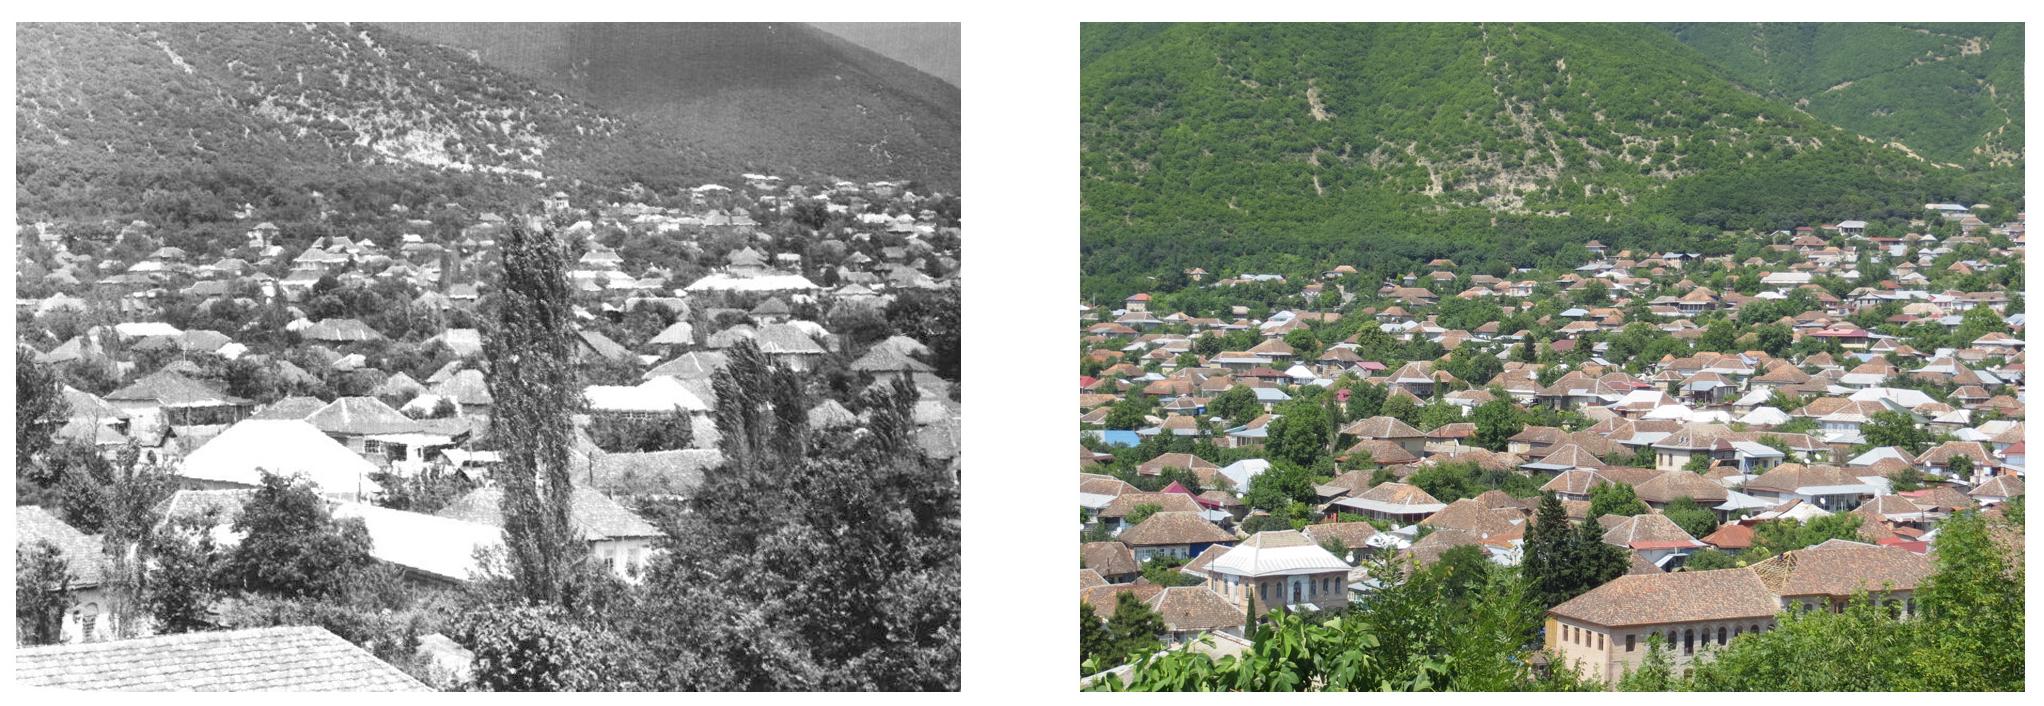 Sheki city garden - Restoration manual - layout-preserved-pan